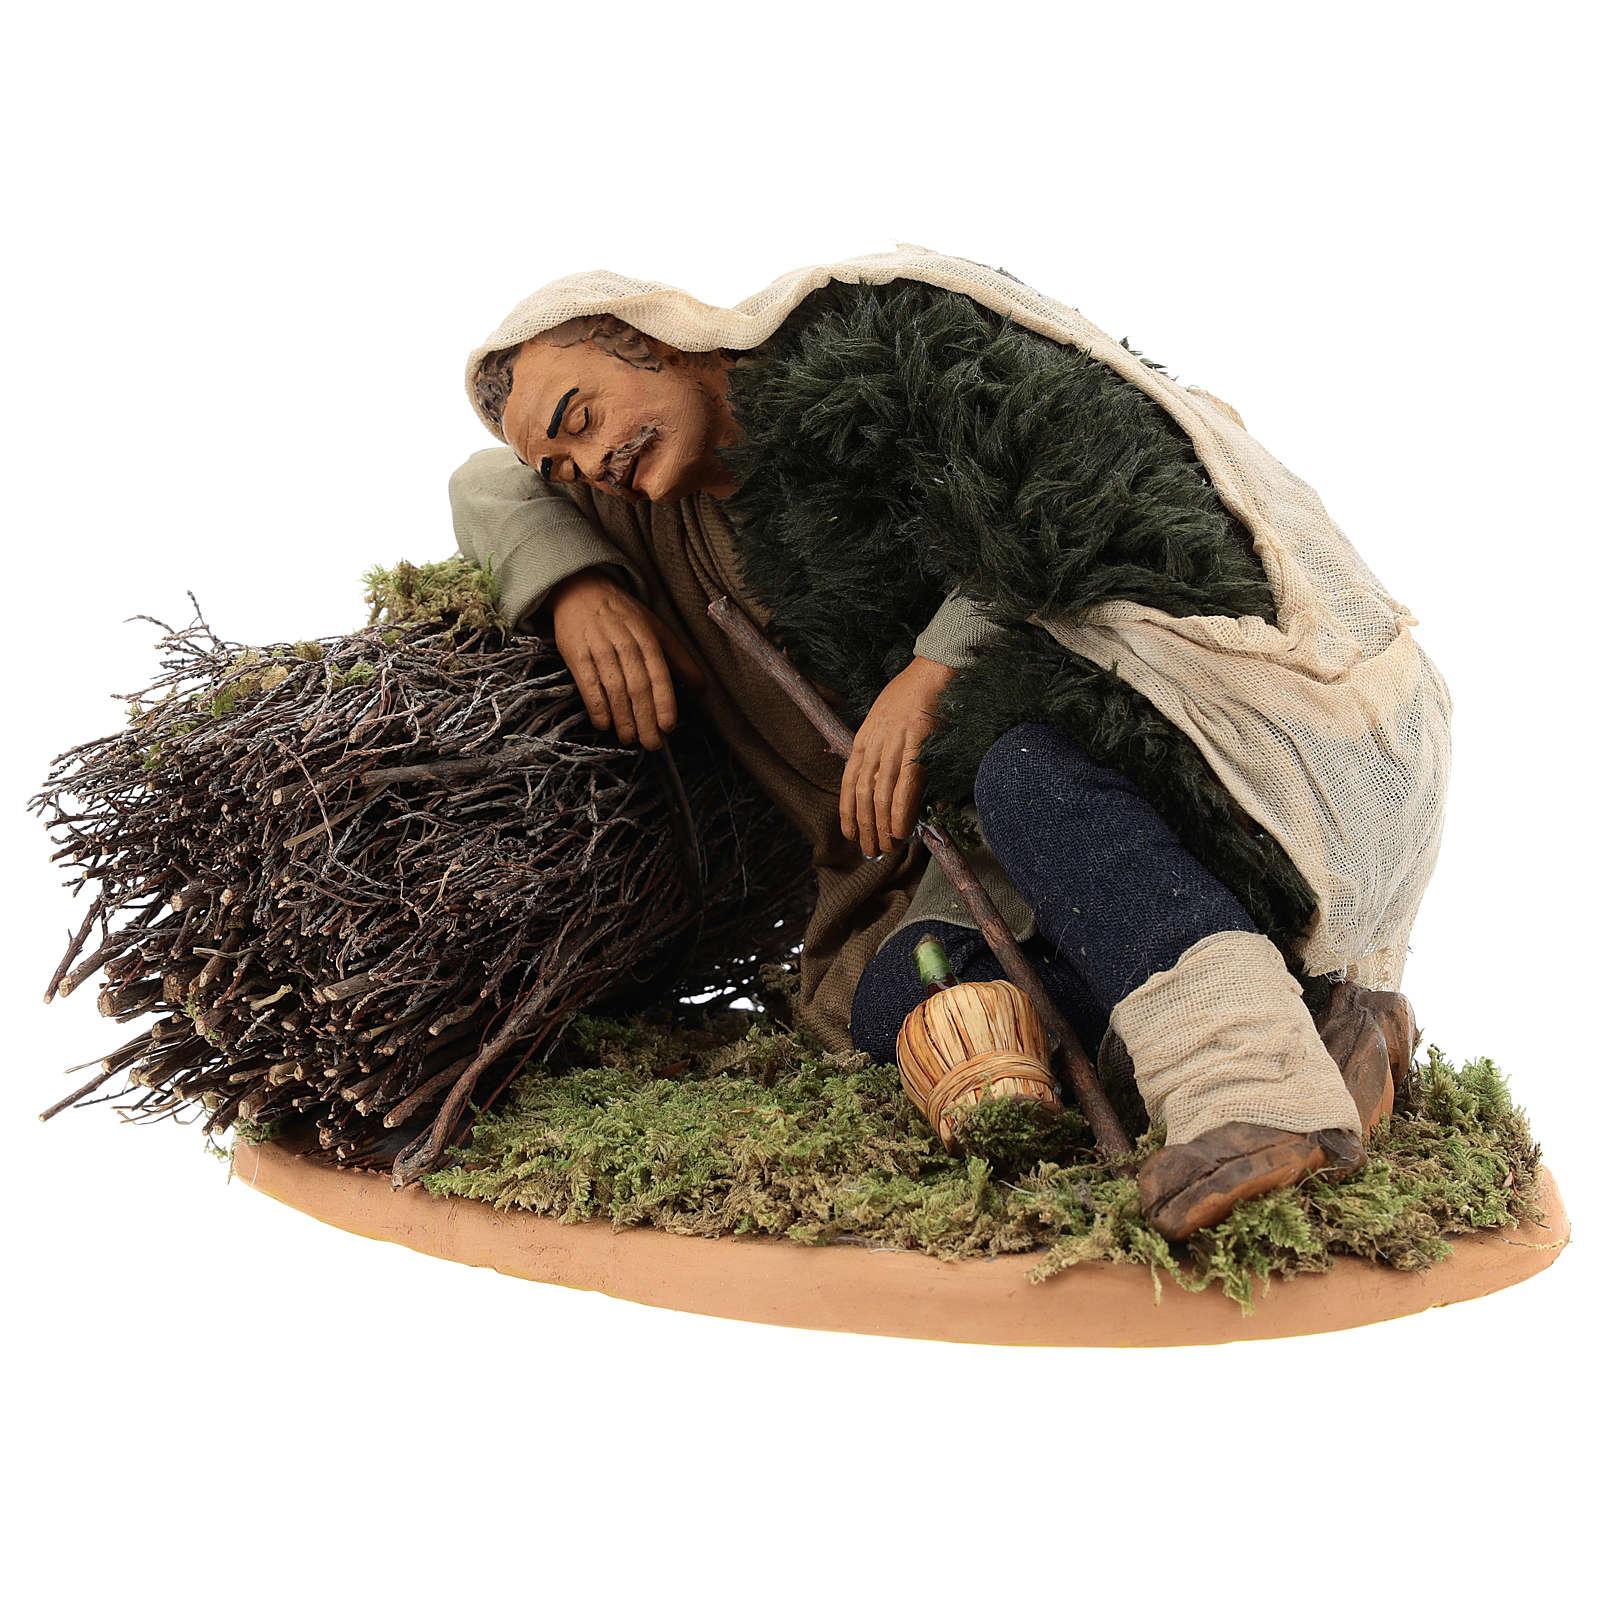 Hombre que duerme 30 cm belén napolitano 4